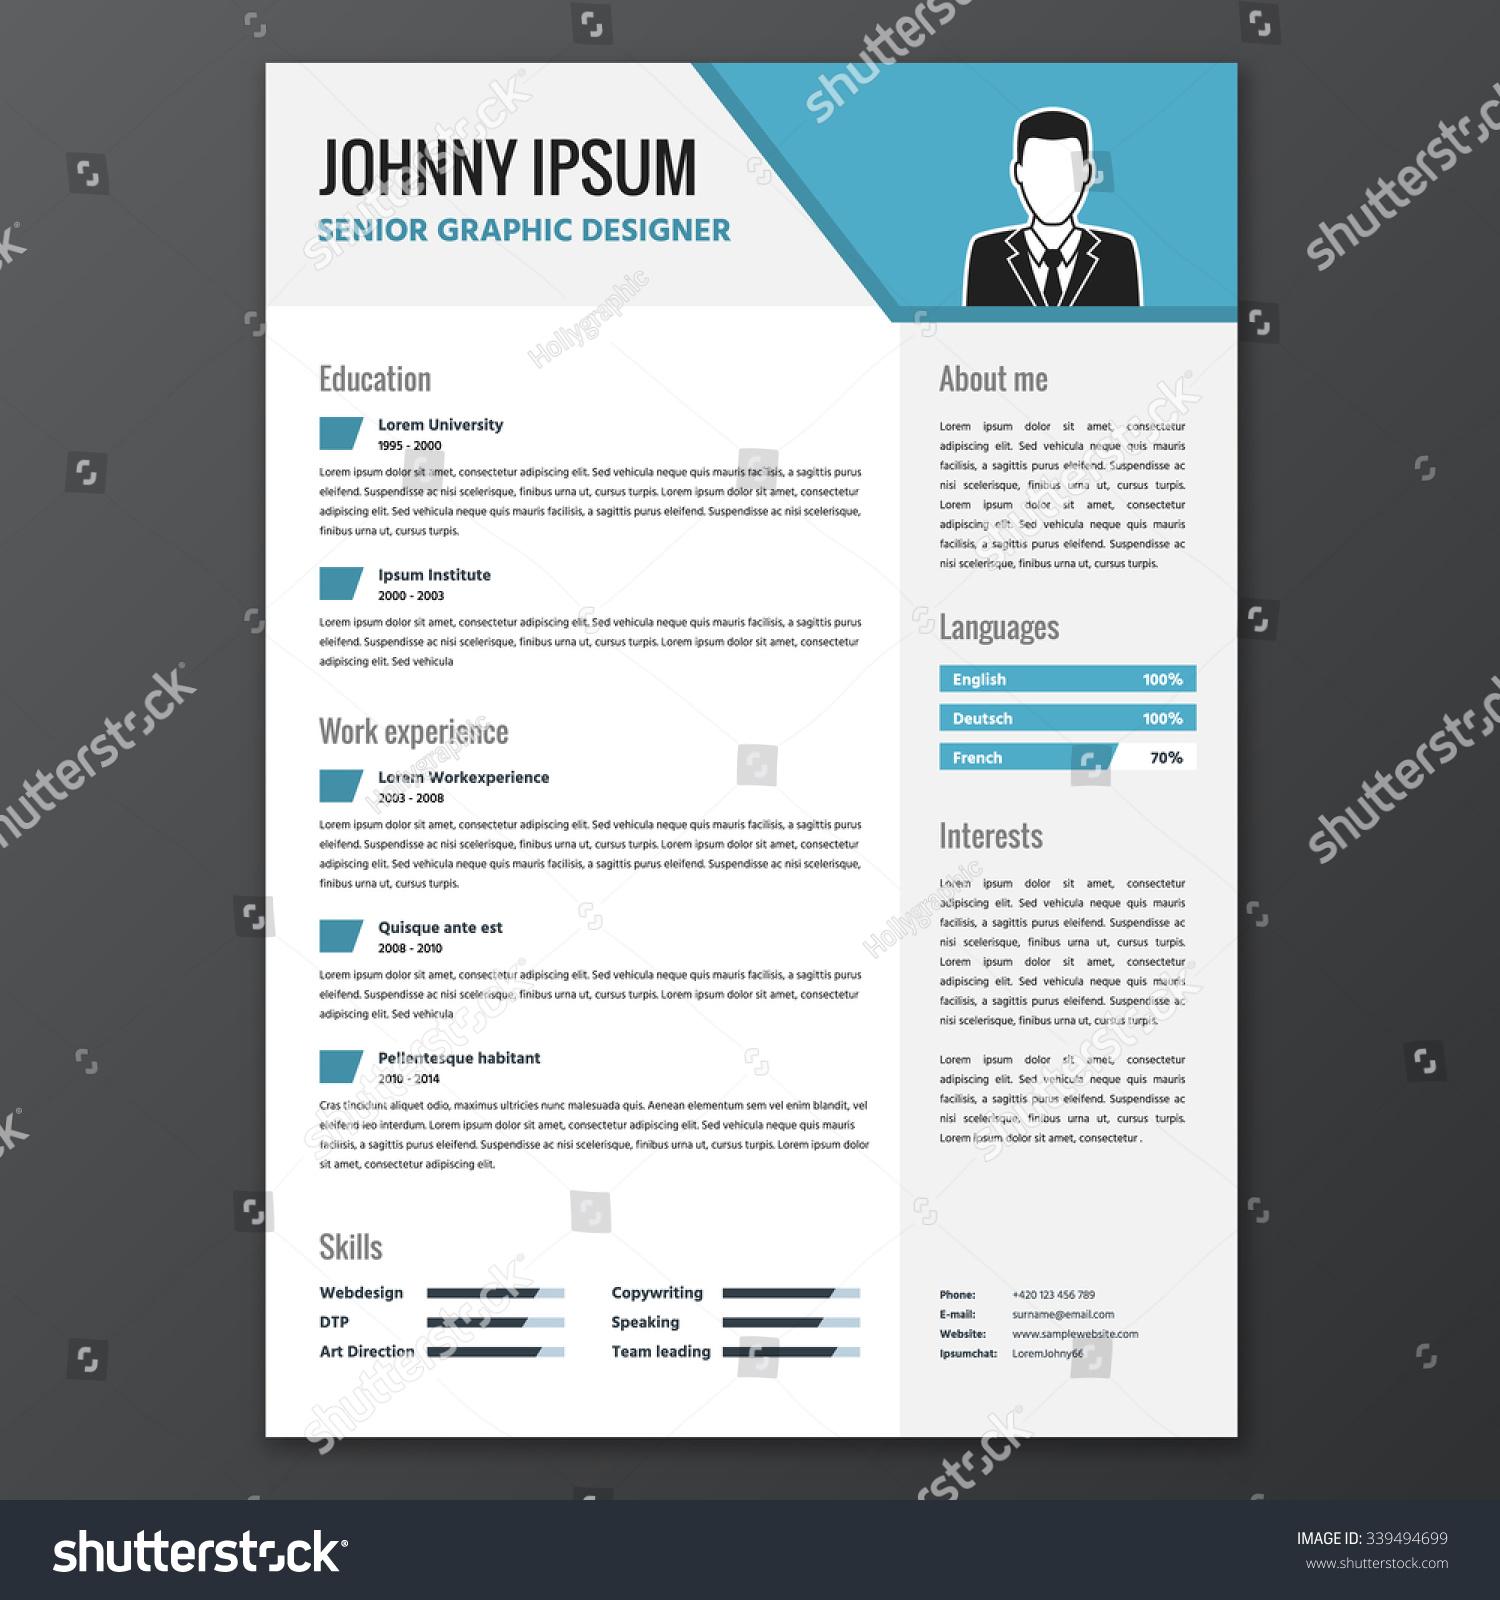 Fancy Resume Templates Free. resume ipixel creative singapore web ...